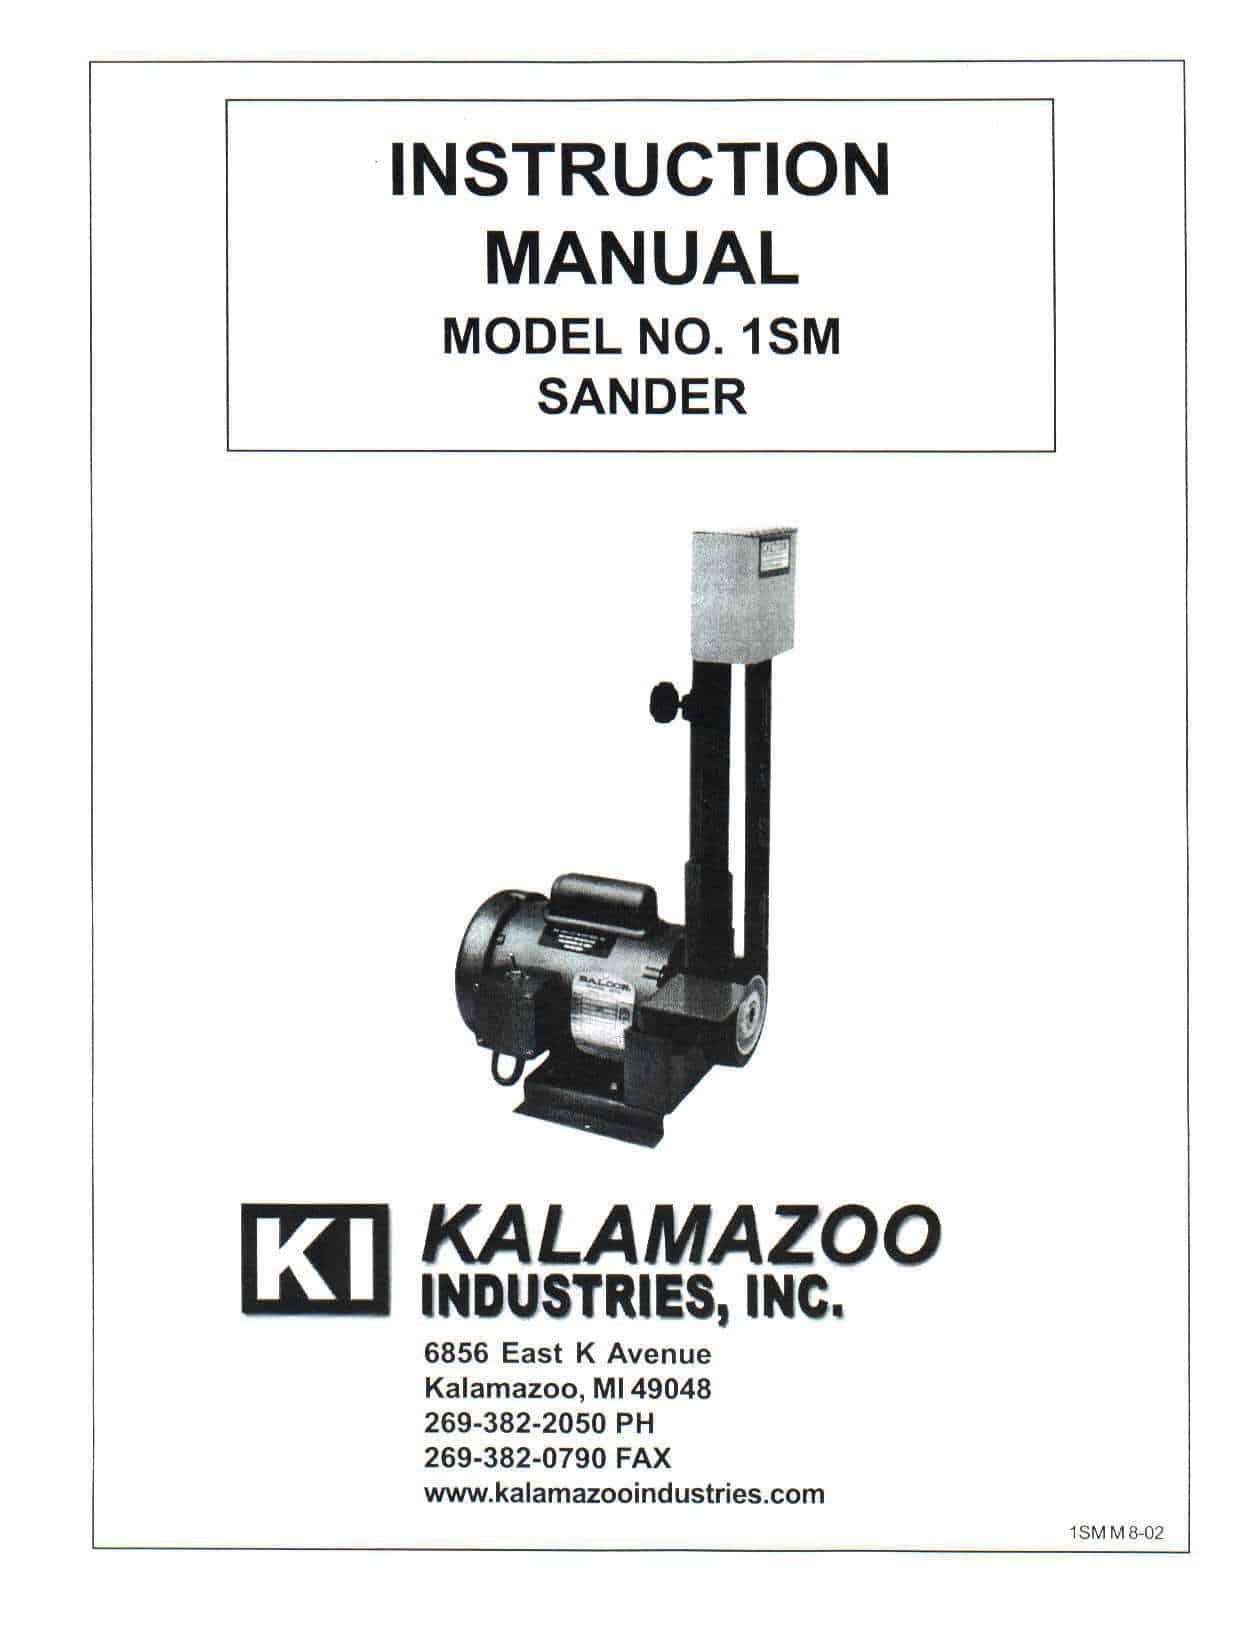 1SM 1 X 42 inch belt sander manual